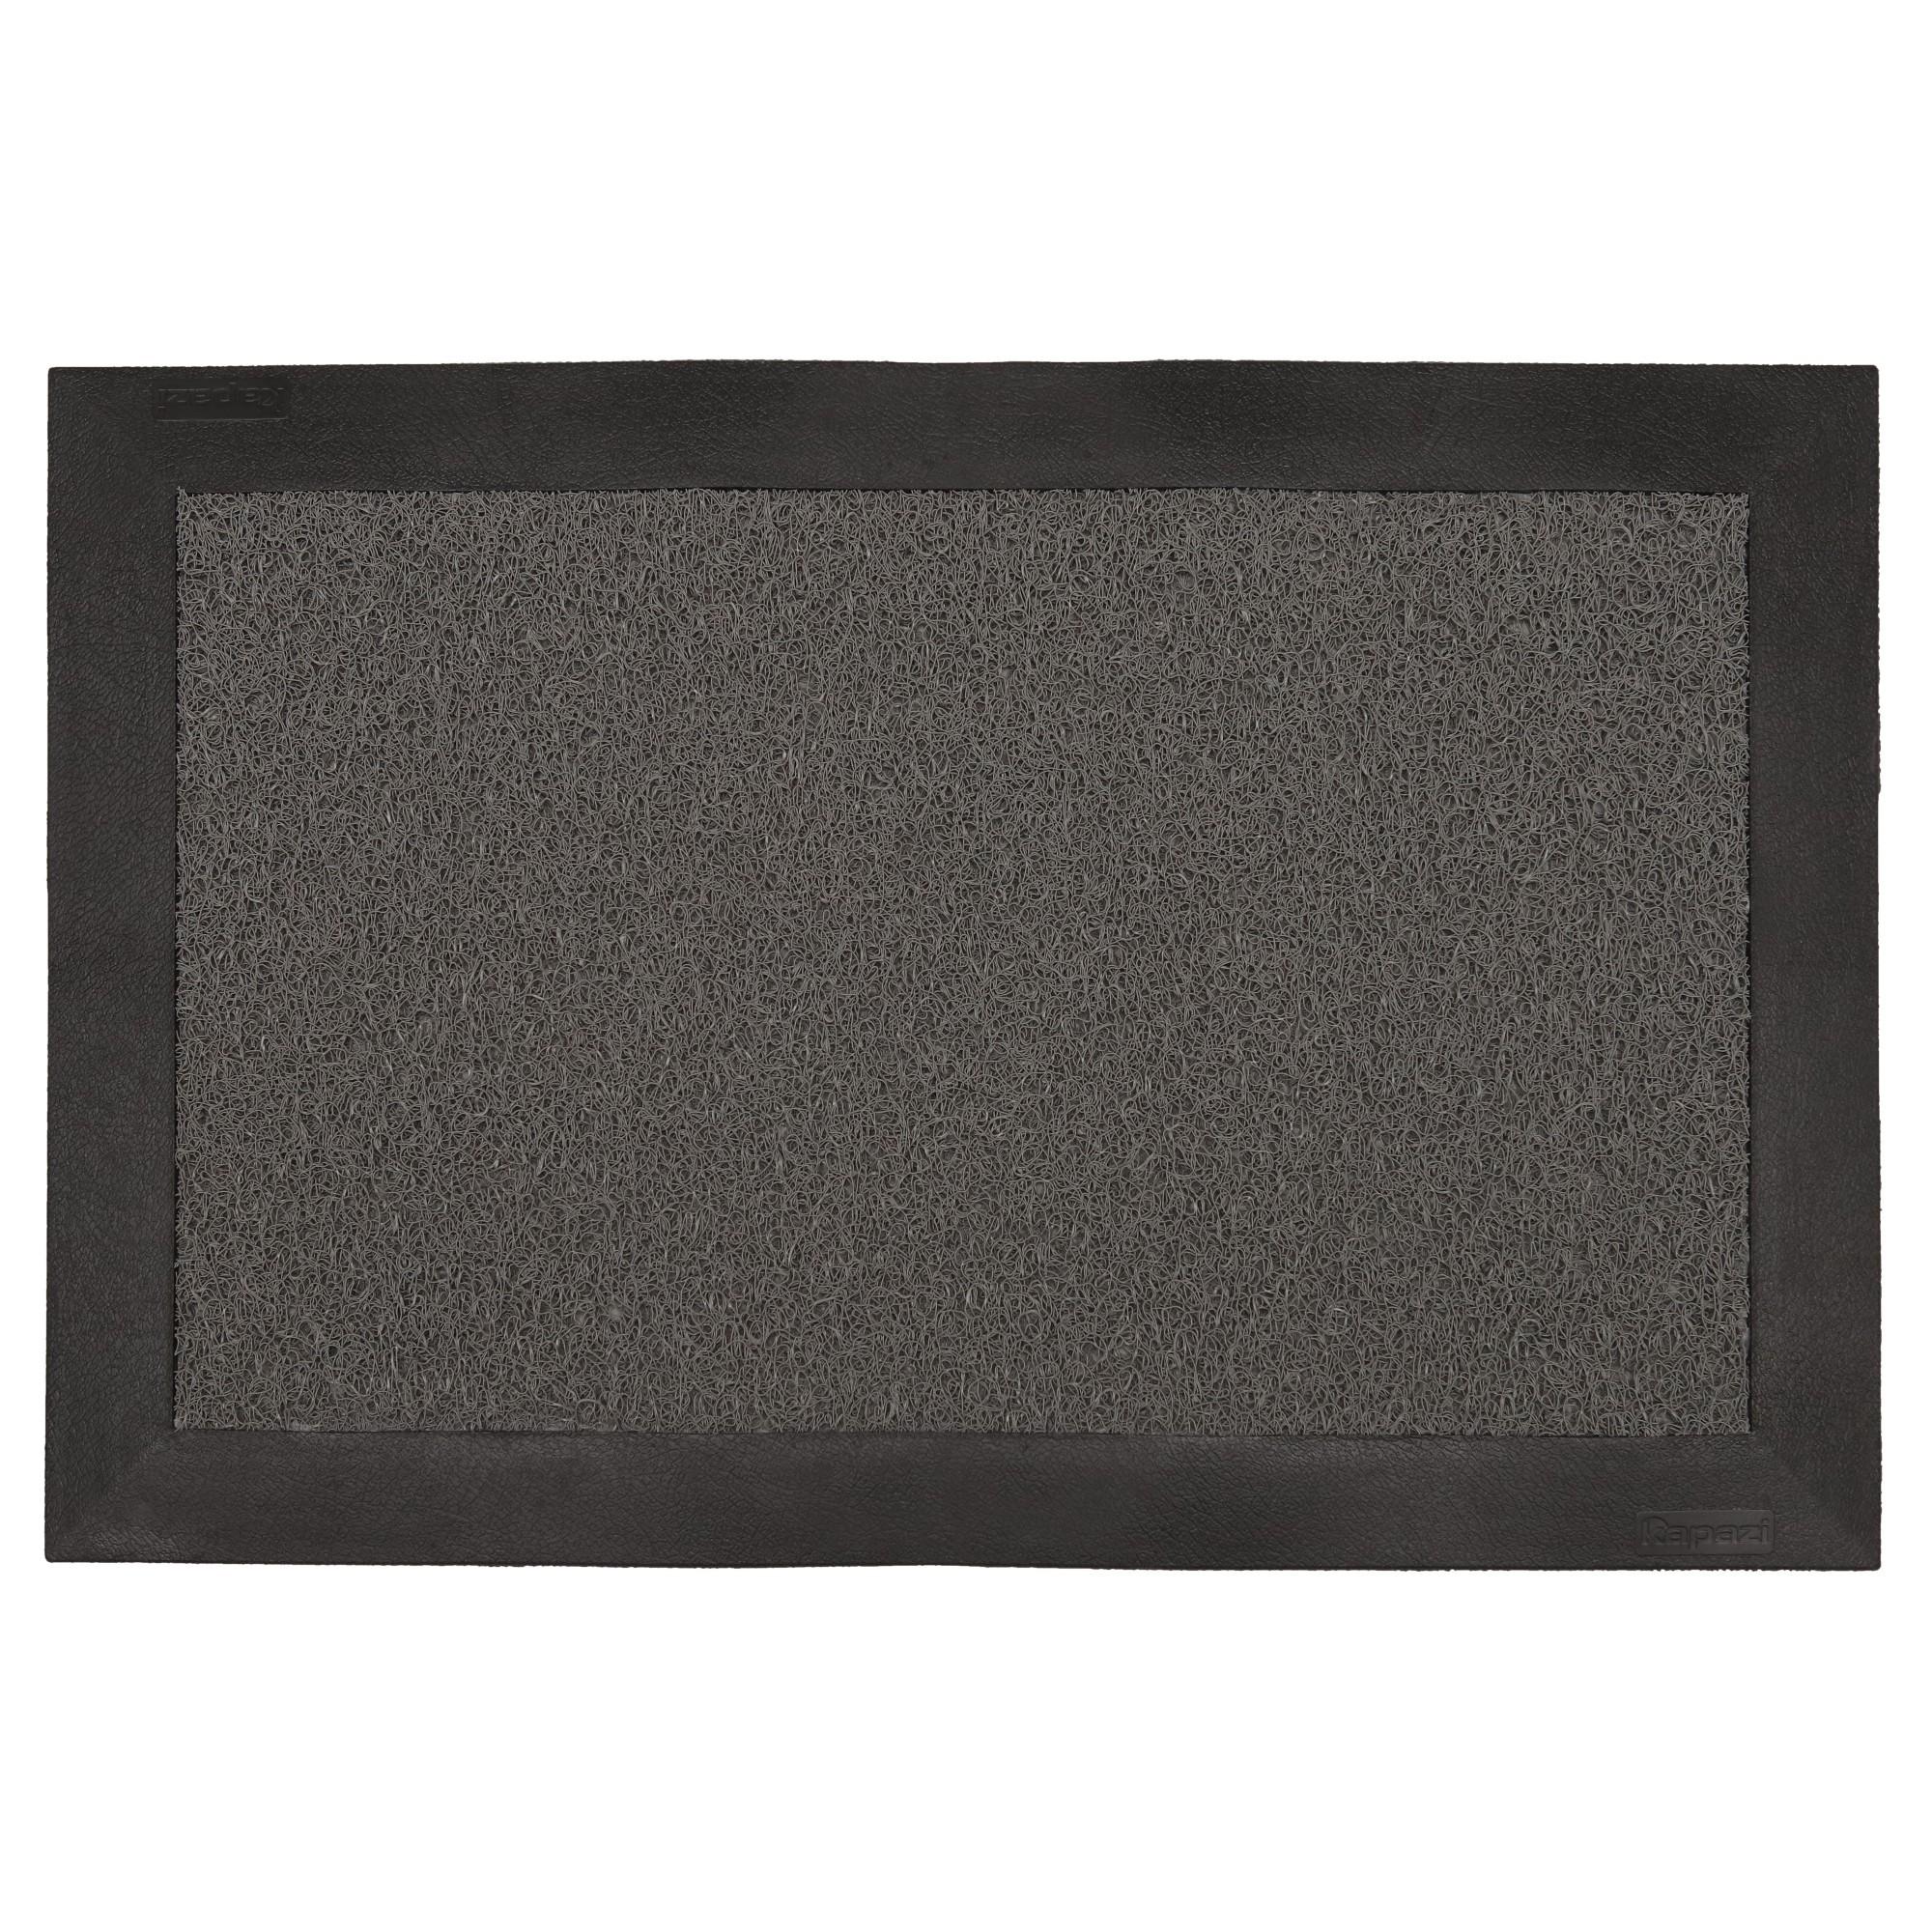 Tapete Sanitizante Pediluvio para Entrada Kapazi 60x80 cm Cinza TKS0501